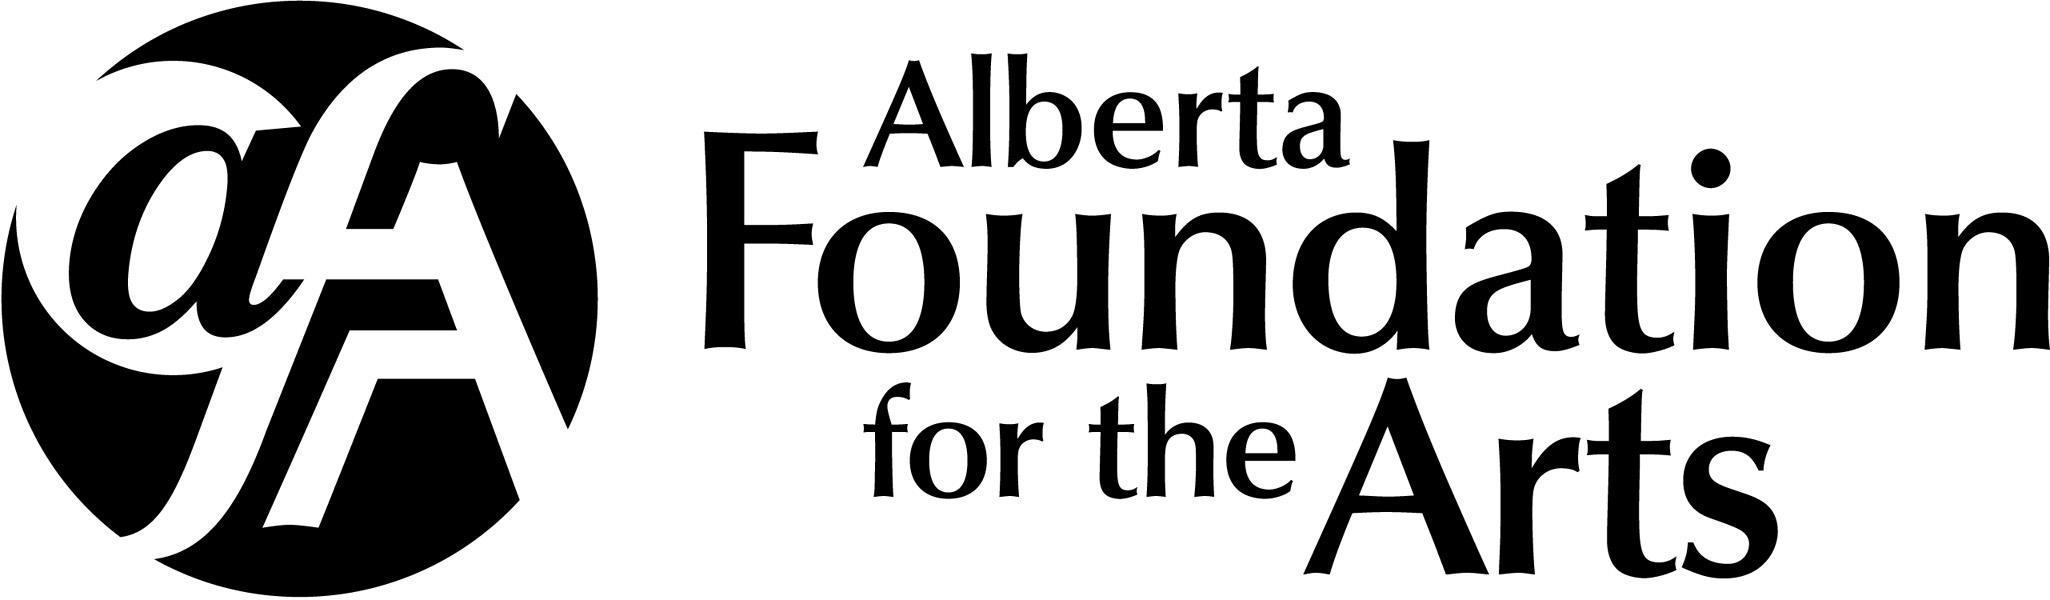 The Alberta Foundation of Arts celebrates 25 years